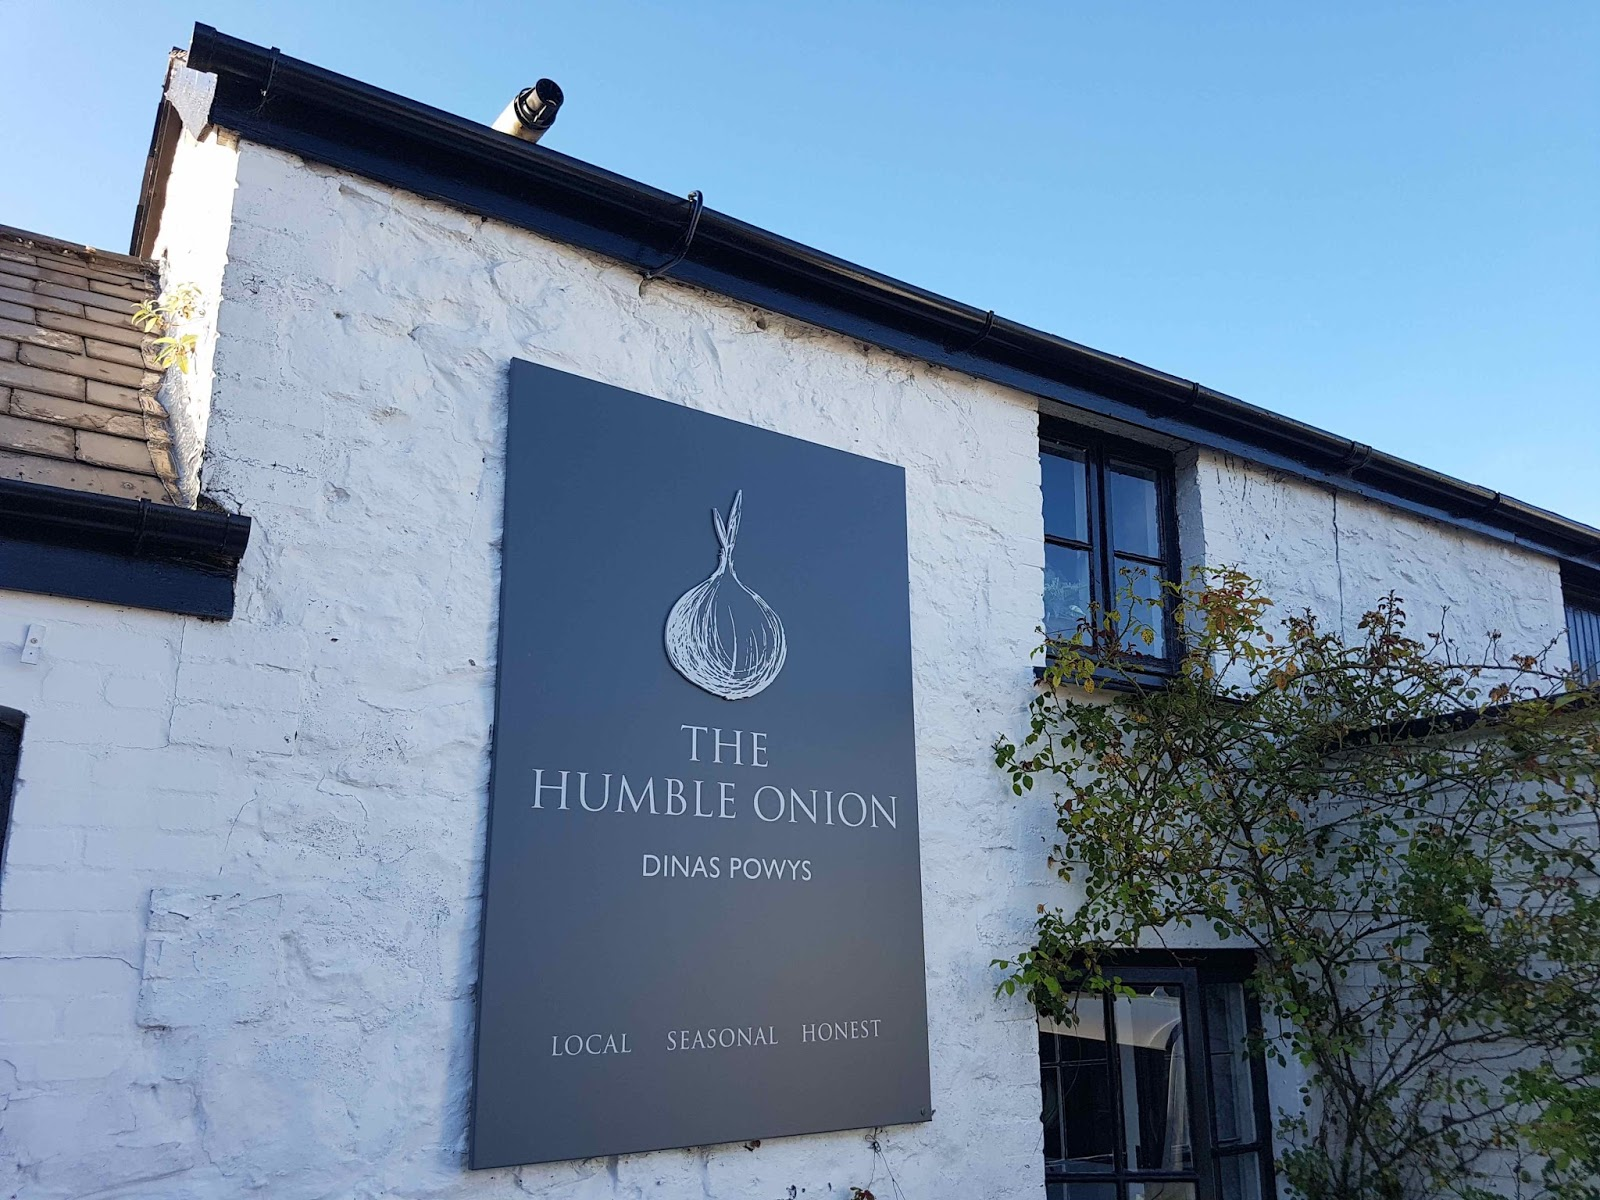 GourmetGorro: The Humble Onion, Dinas Powys, Vale of Glamorgan ...